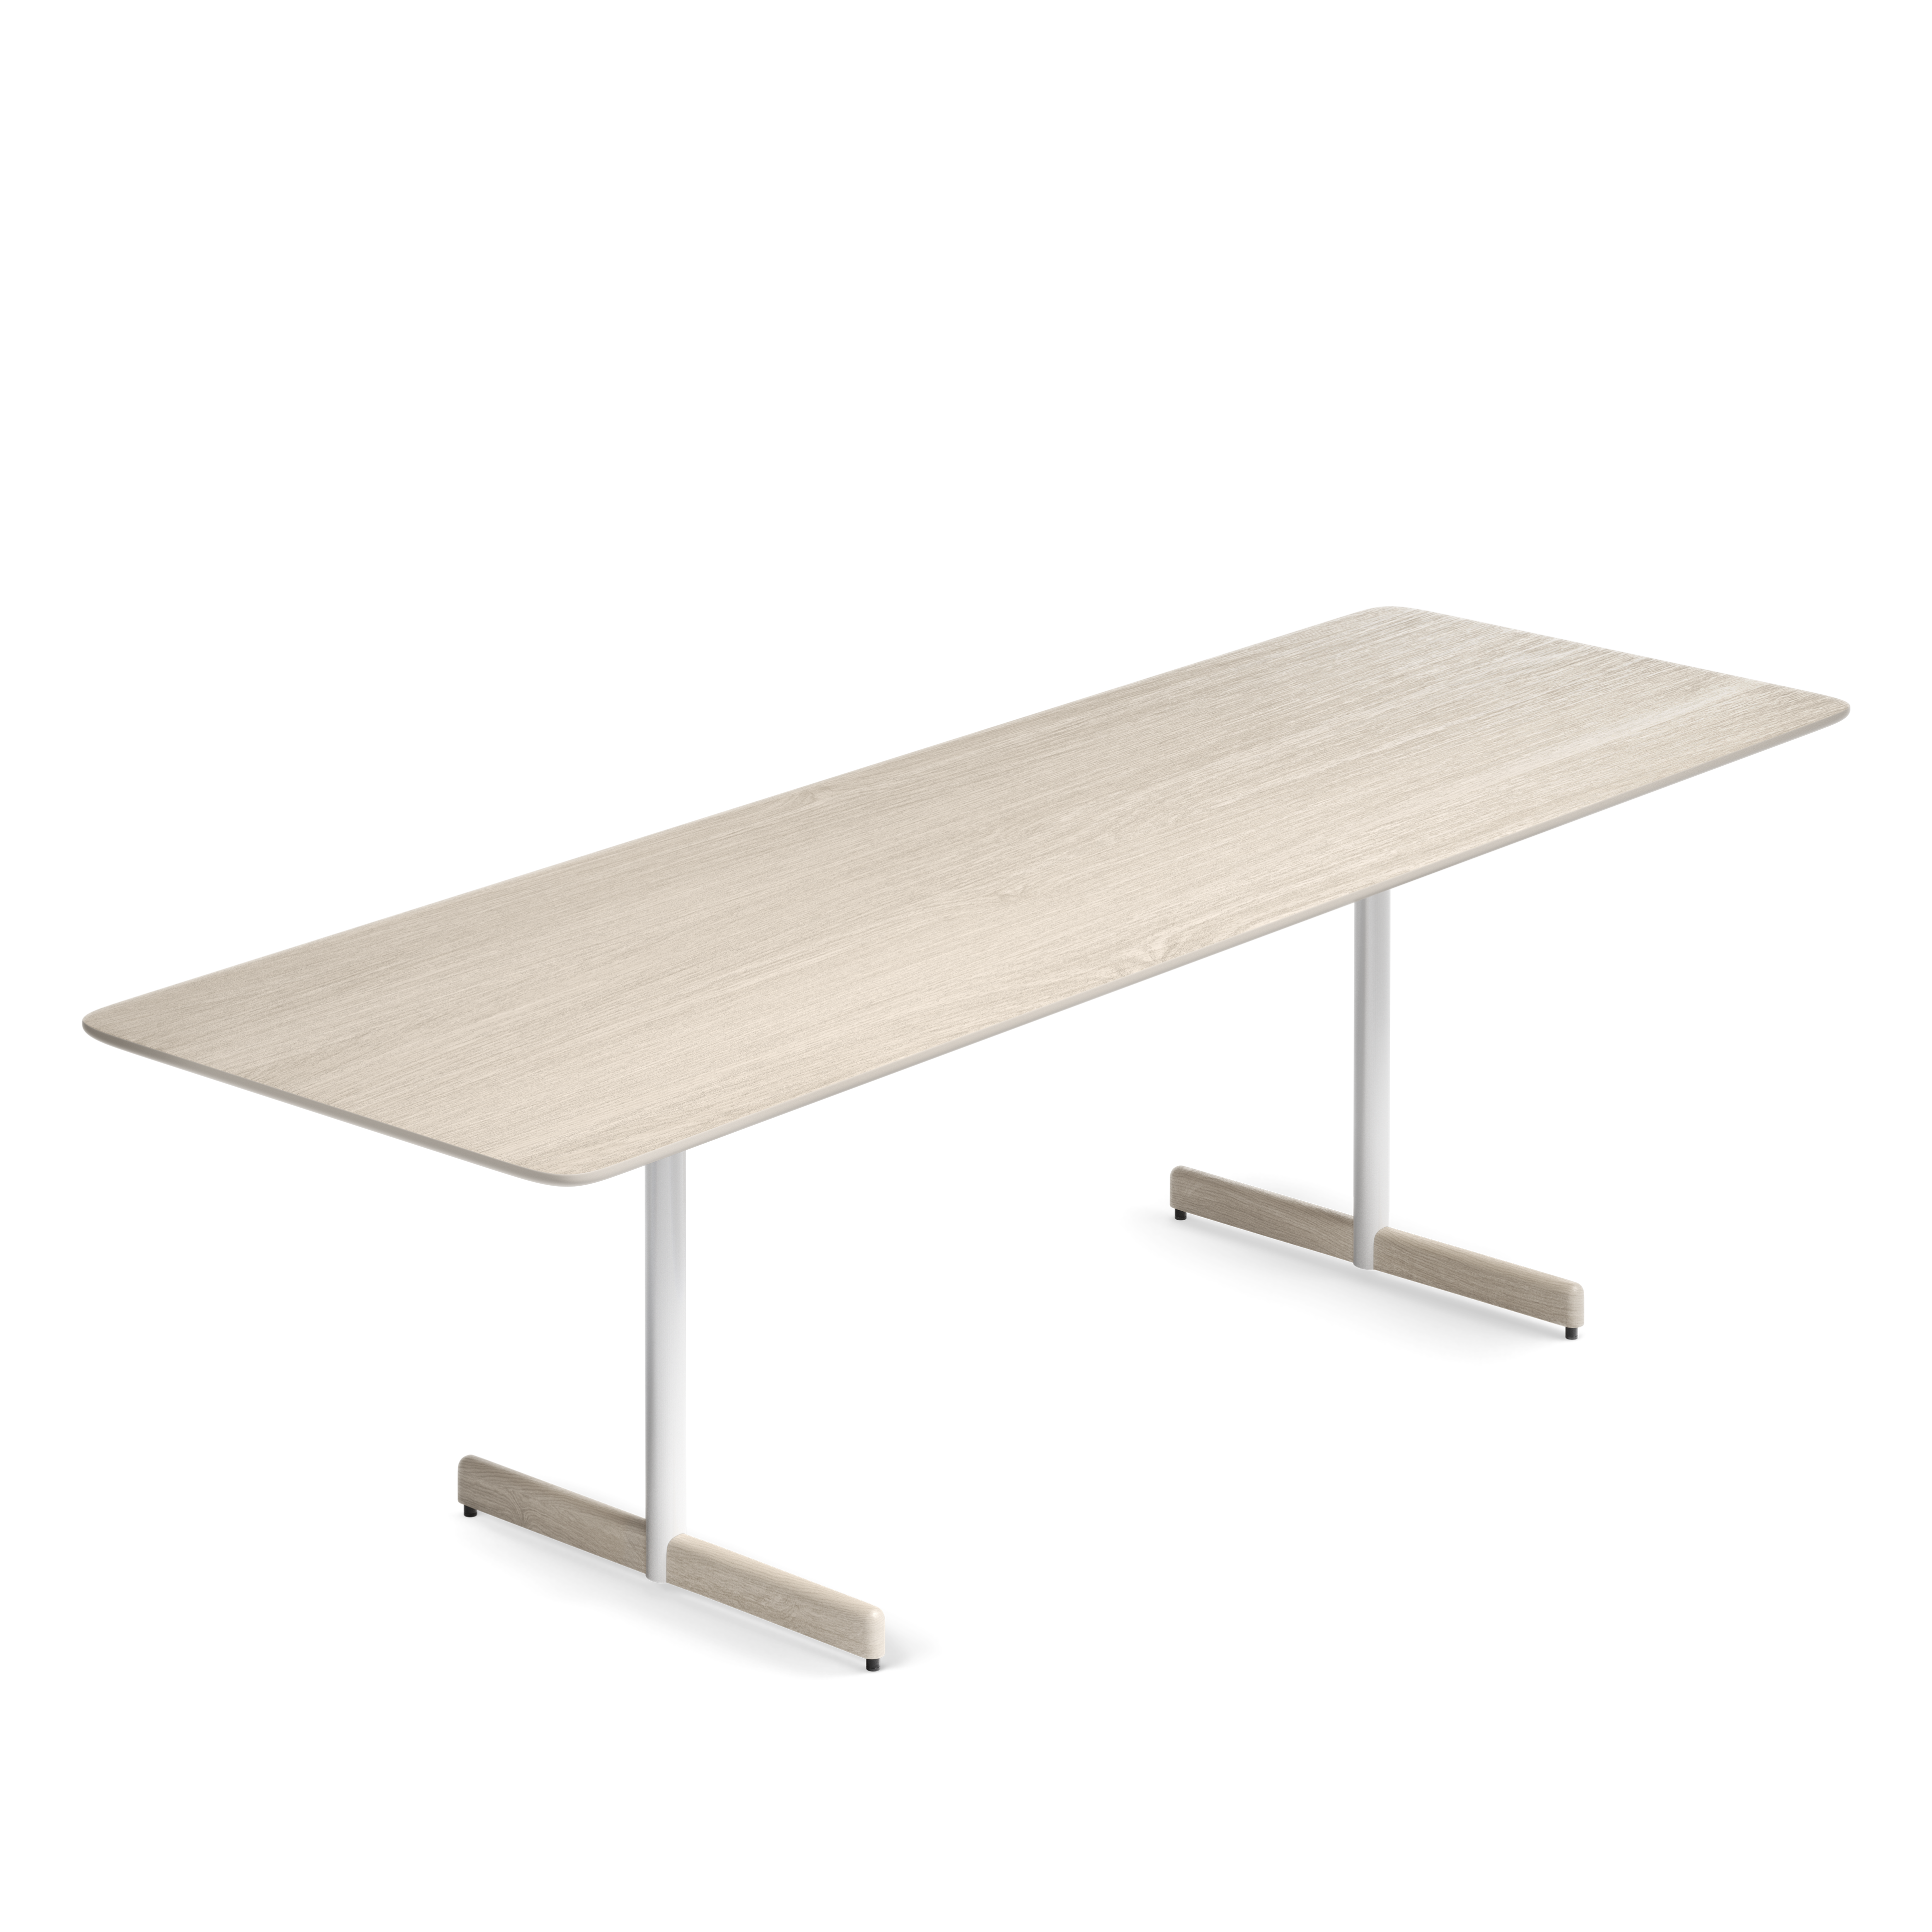 Myk bord 240x80 cm hvitvasket eik Fora Form